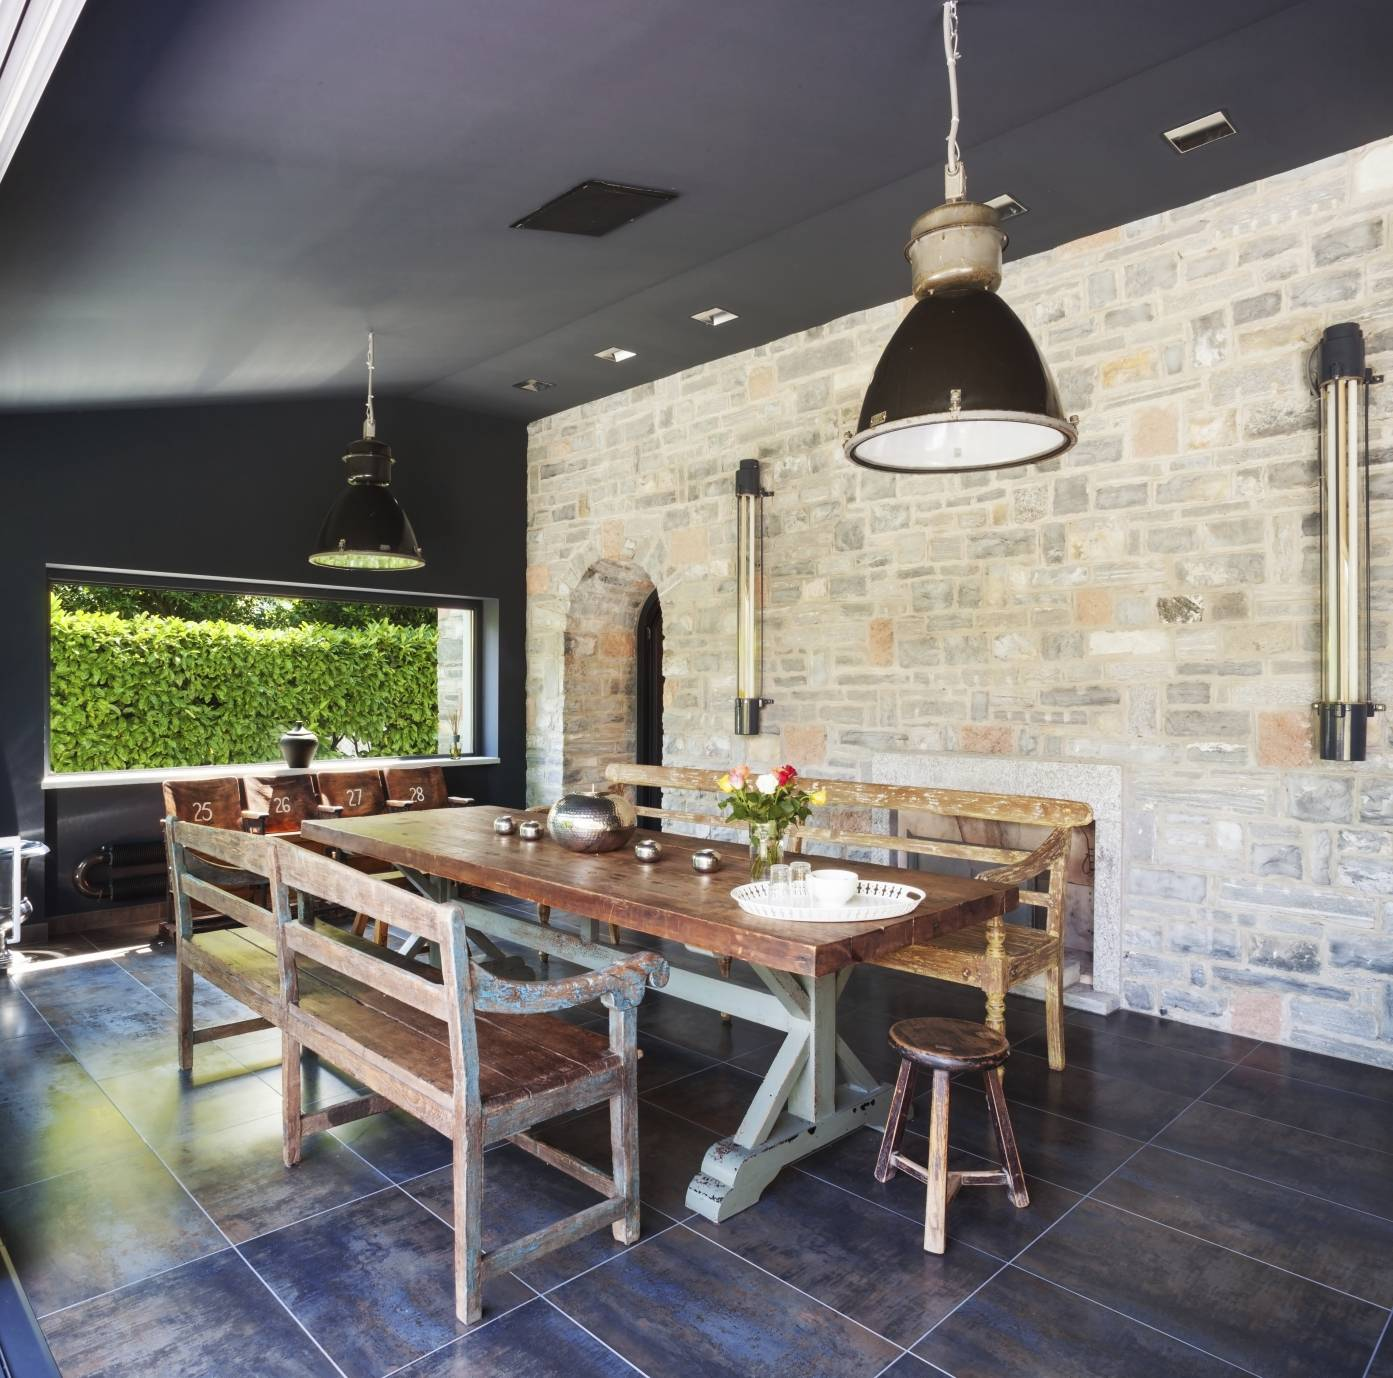 des id es pour meubler et d corer votre salle manger. Black Bedroom Furniture Sets. Home Design Ideas